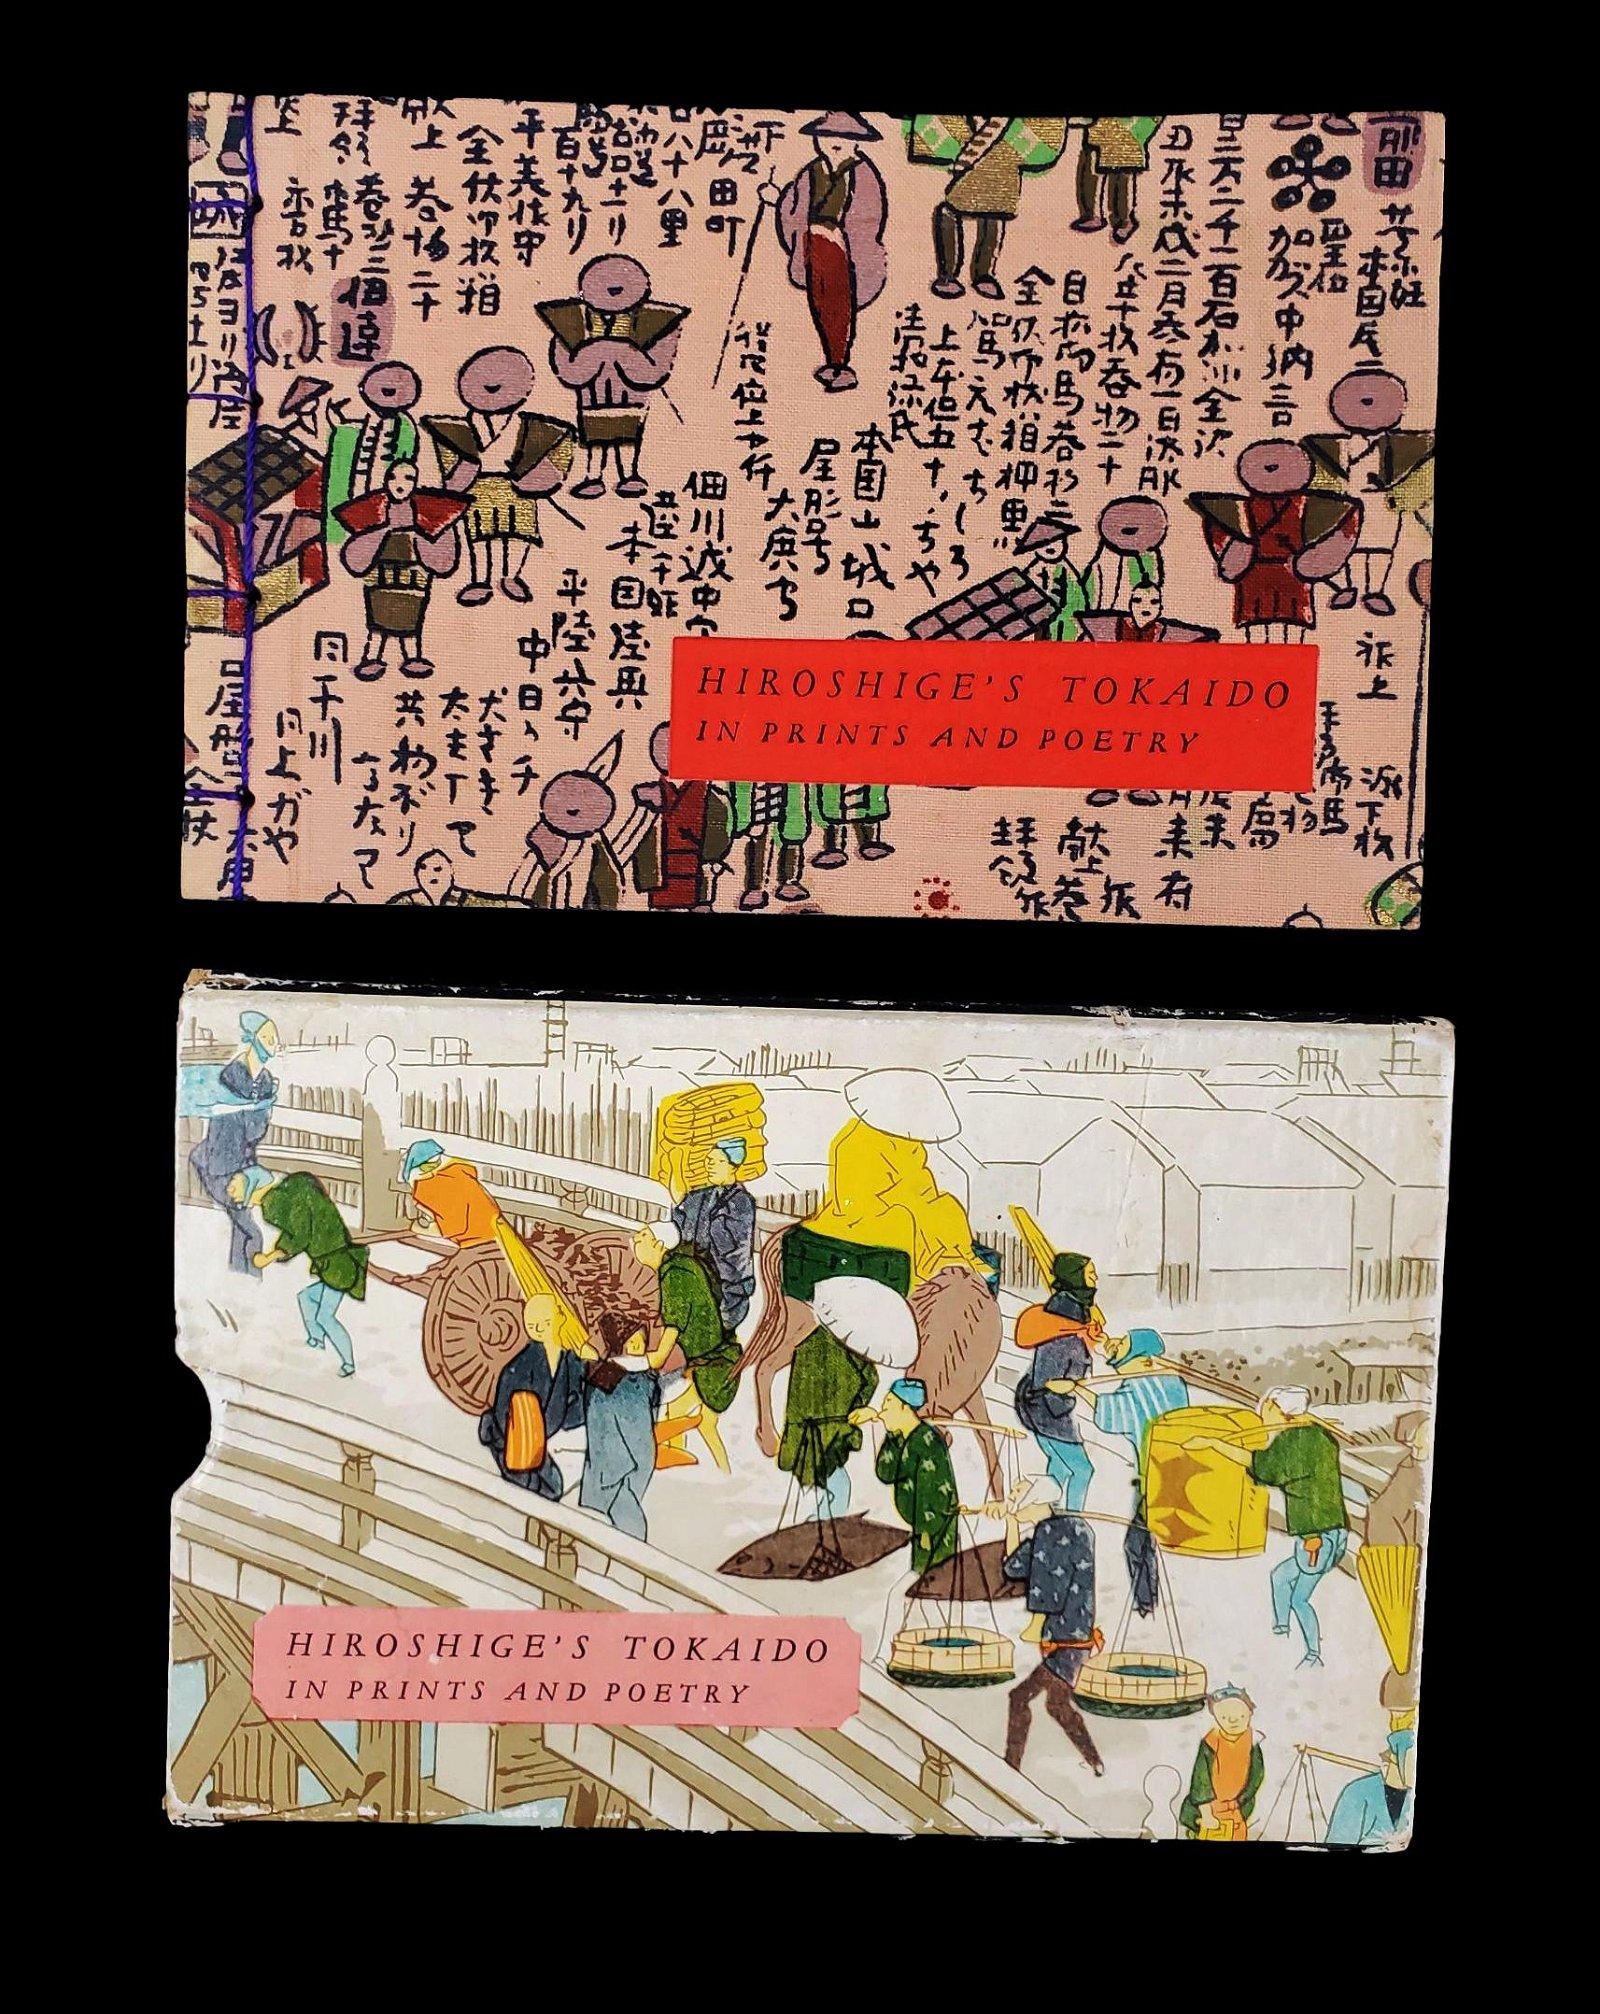 1959 Hiroshige Tokaido Prints & Poetry book signed